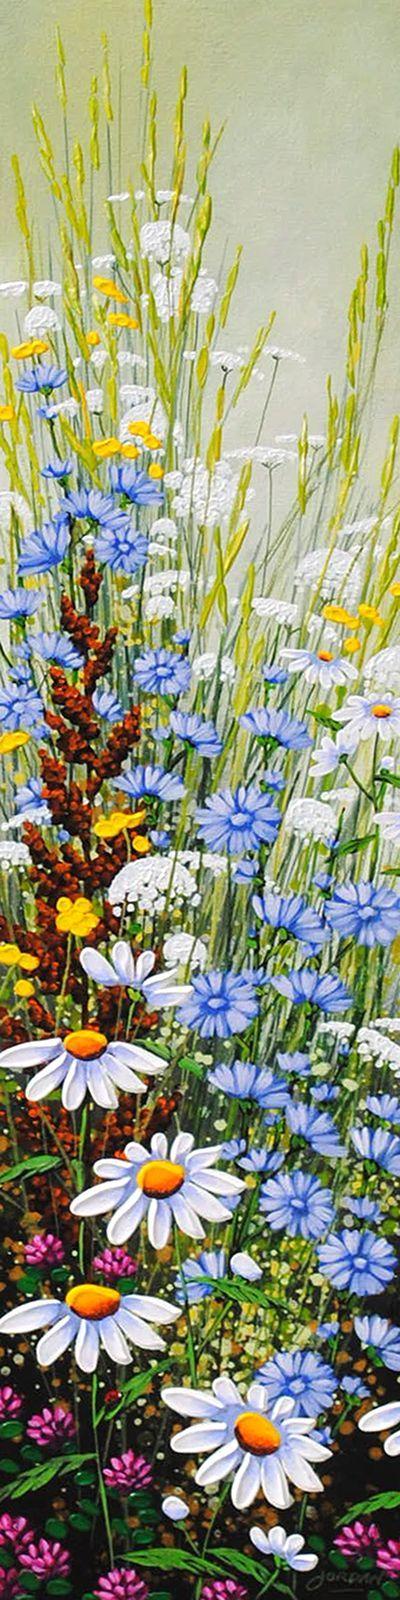 English Landscape Oil Paintings Oblong